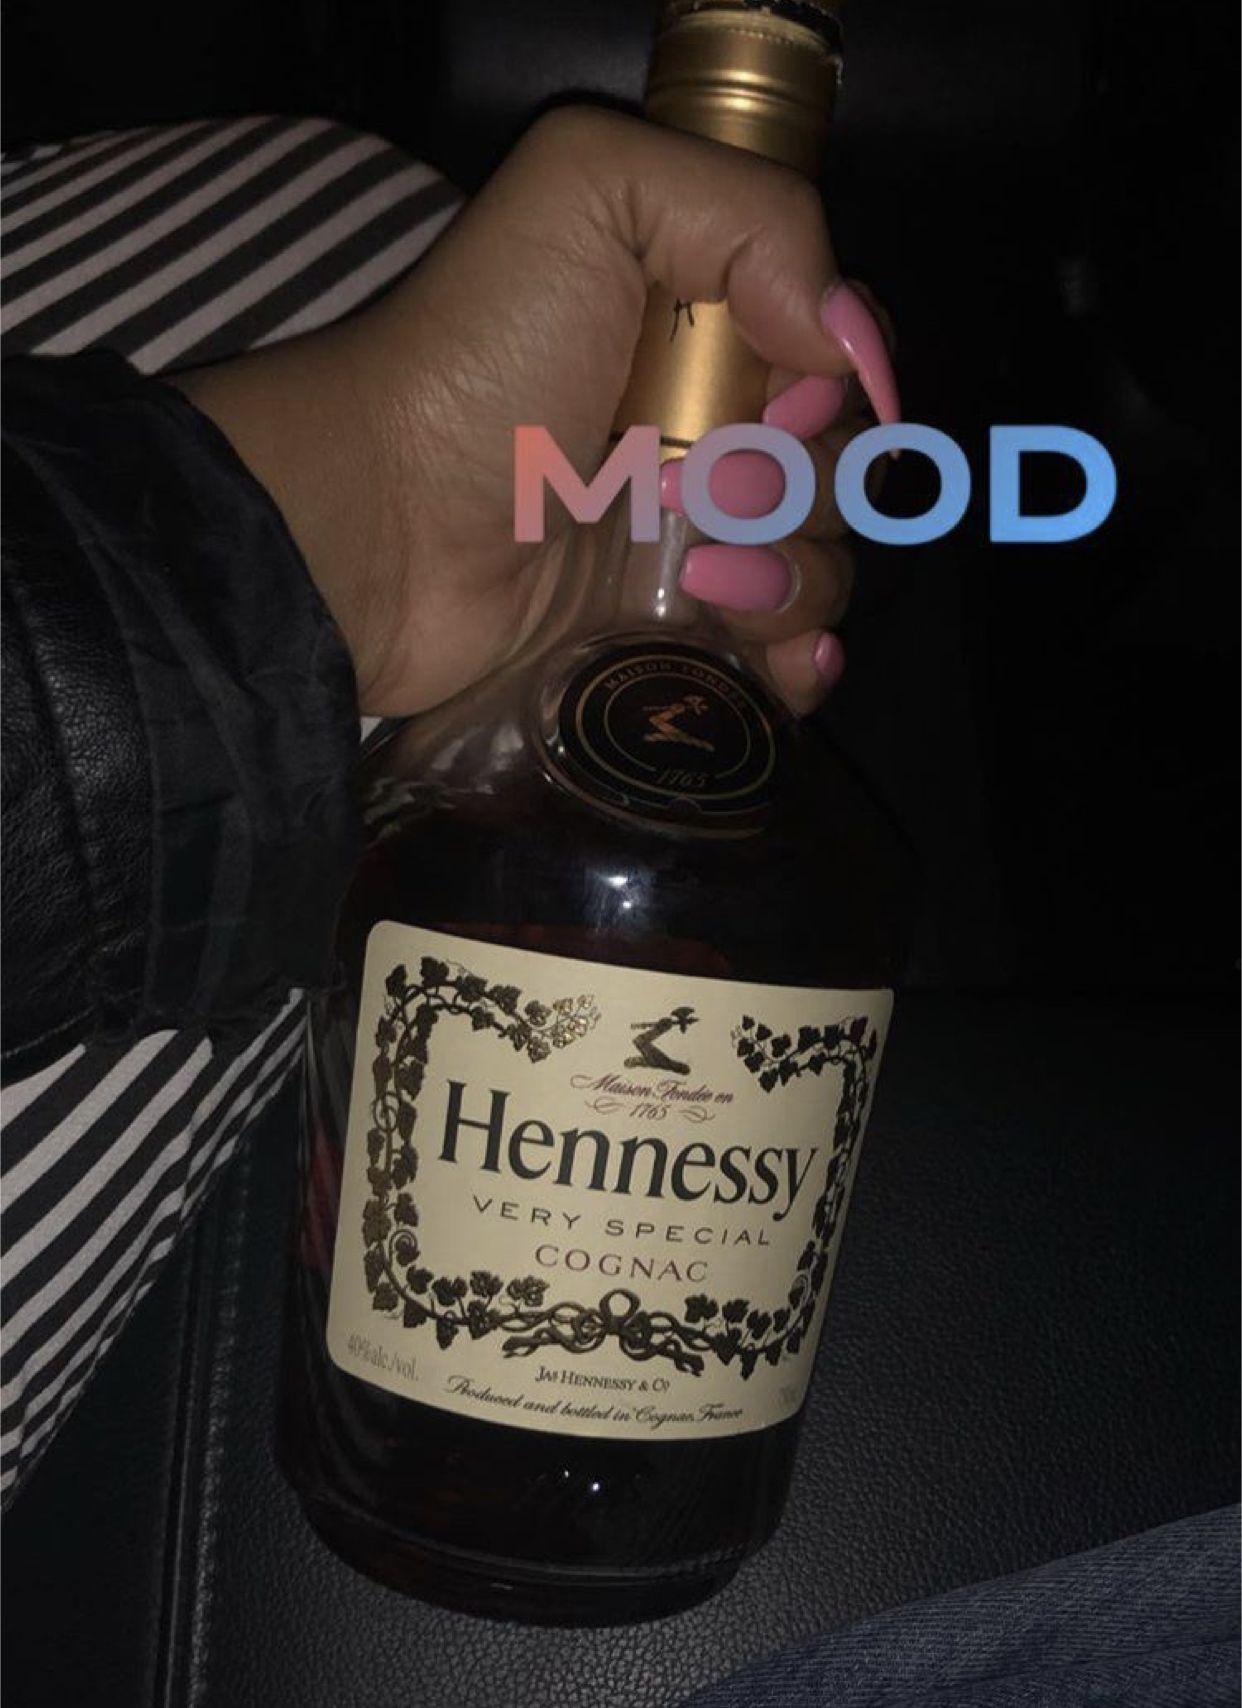 itsdiorjaleia ♡ in 2020 Jack daniels whiskey bottle